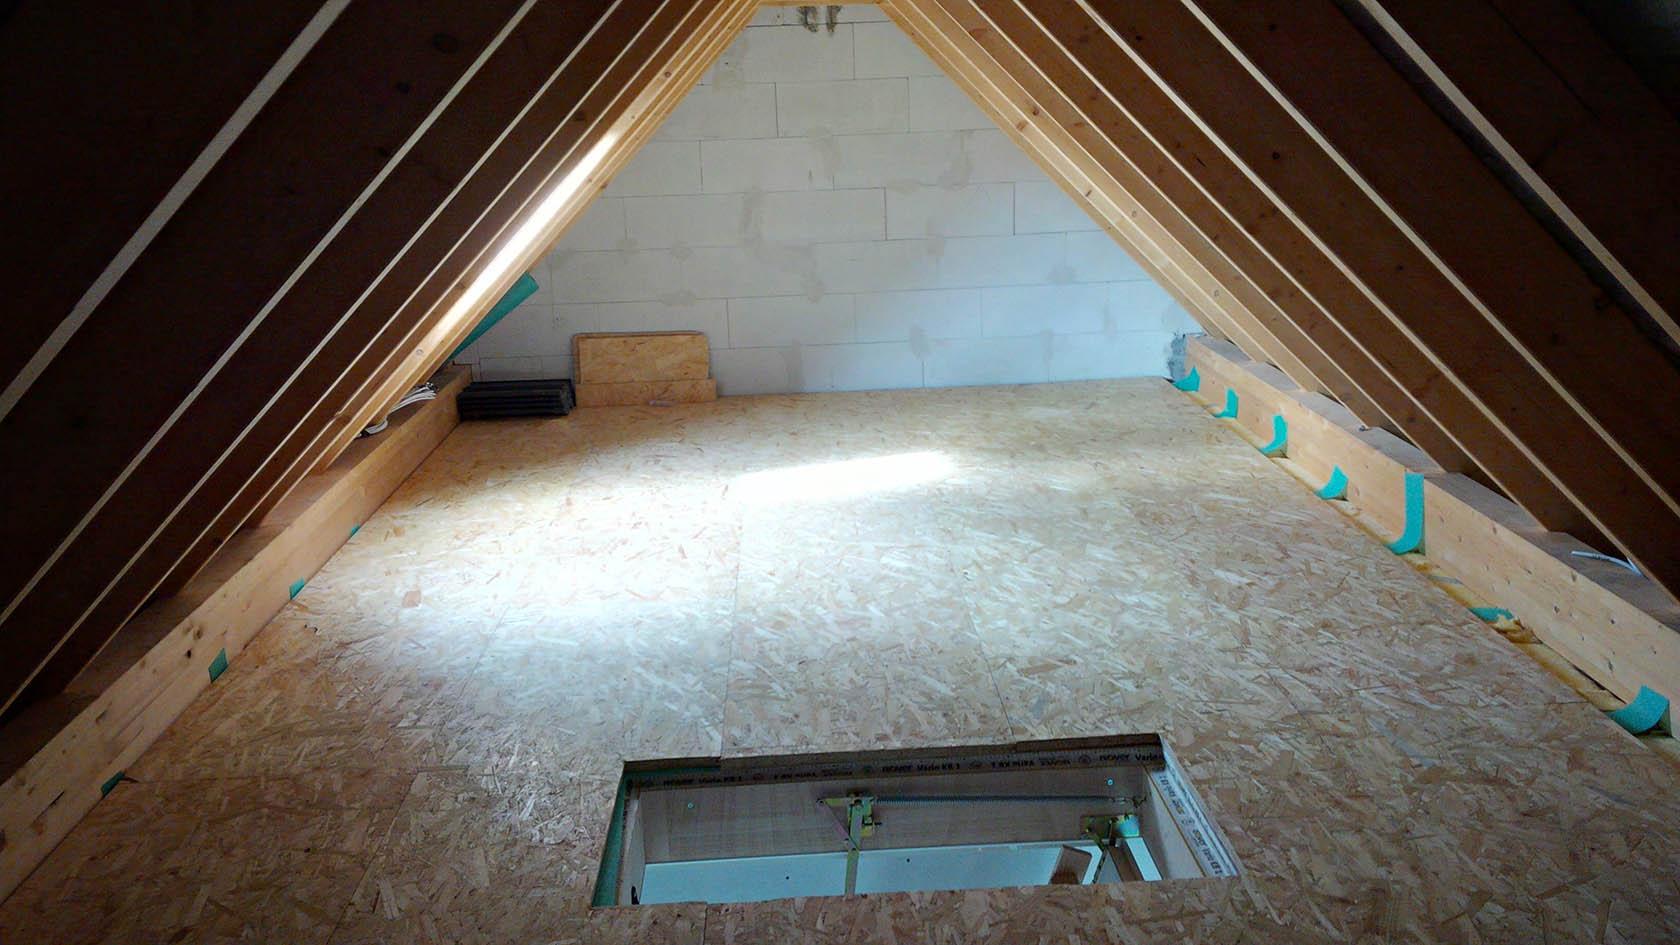 Dachbodenausbau Fußboden Osb ~ Osb platten auf teppich verlegen rauhspund dachboden verlegen